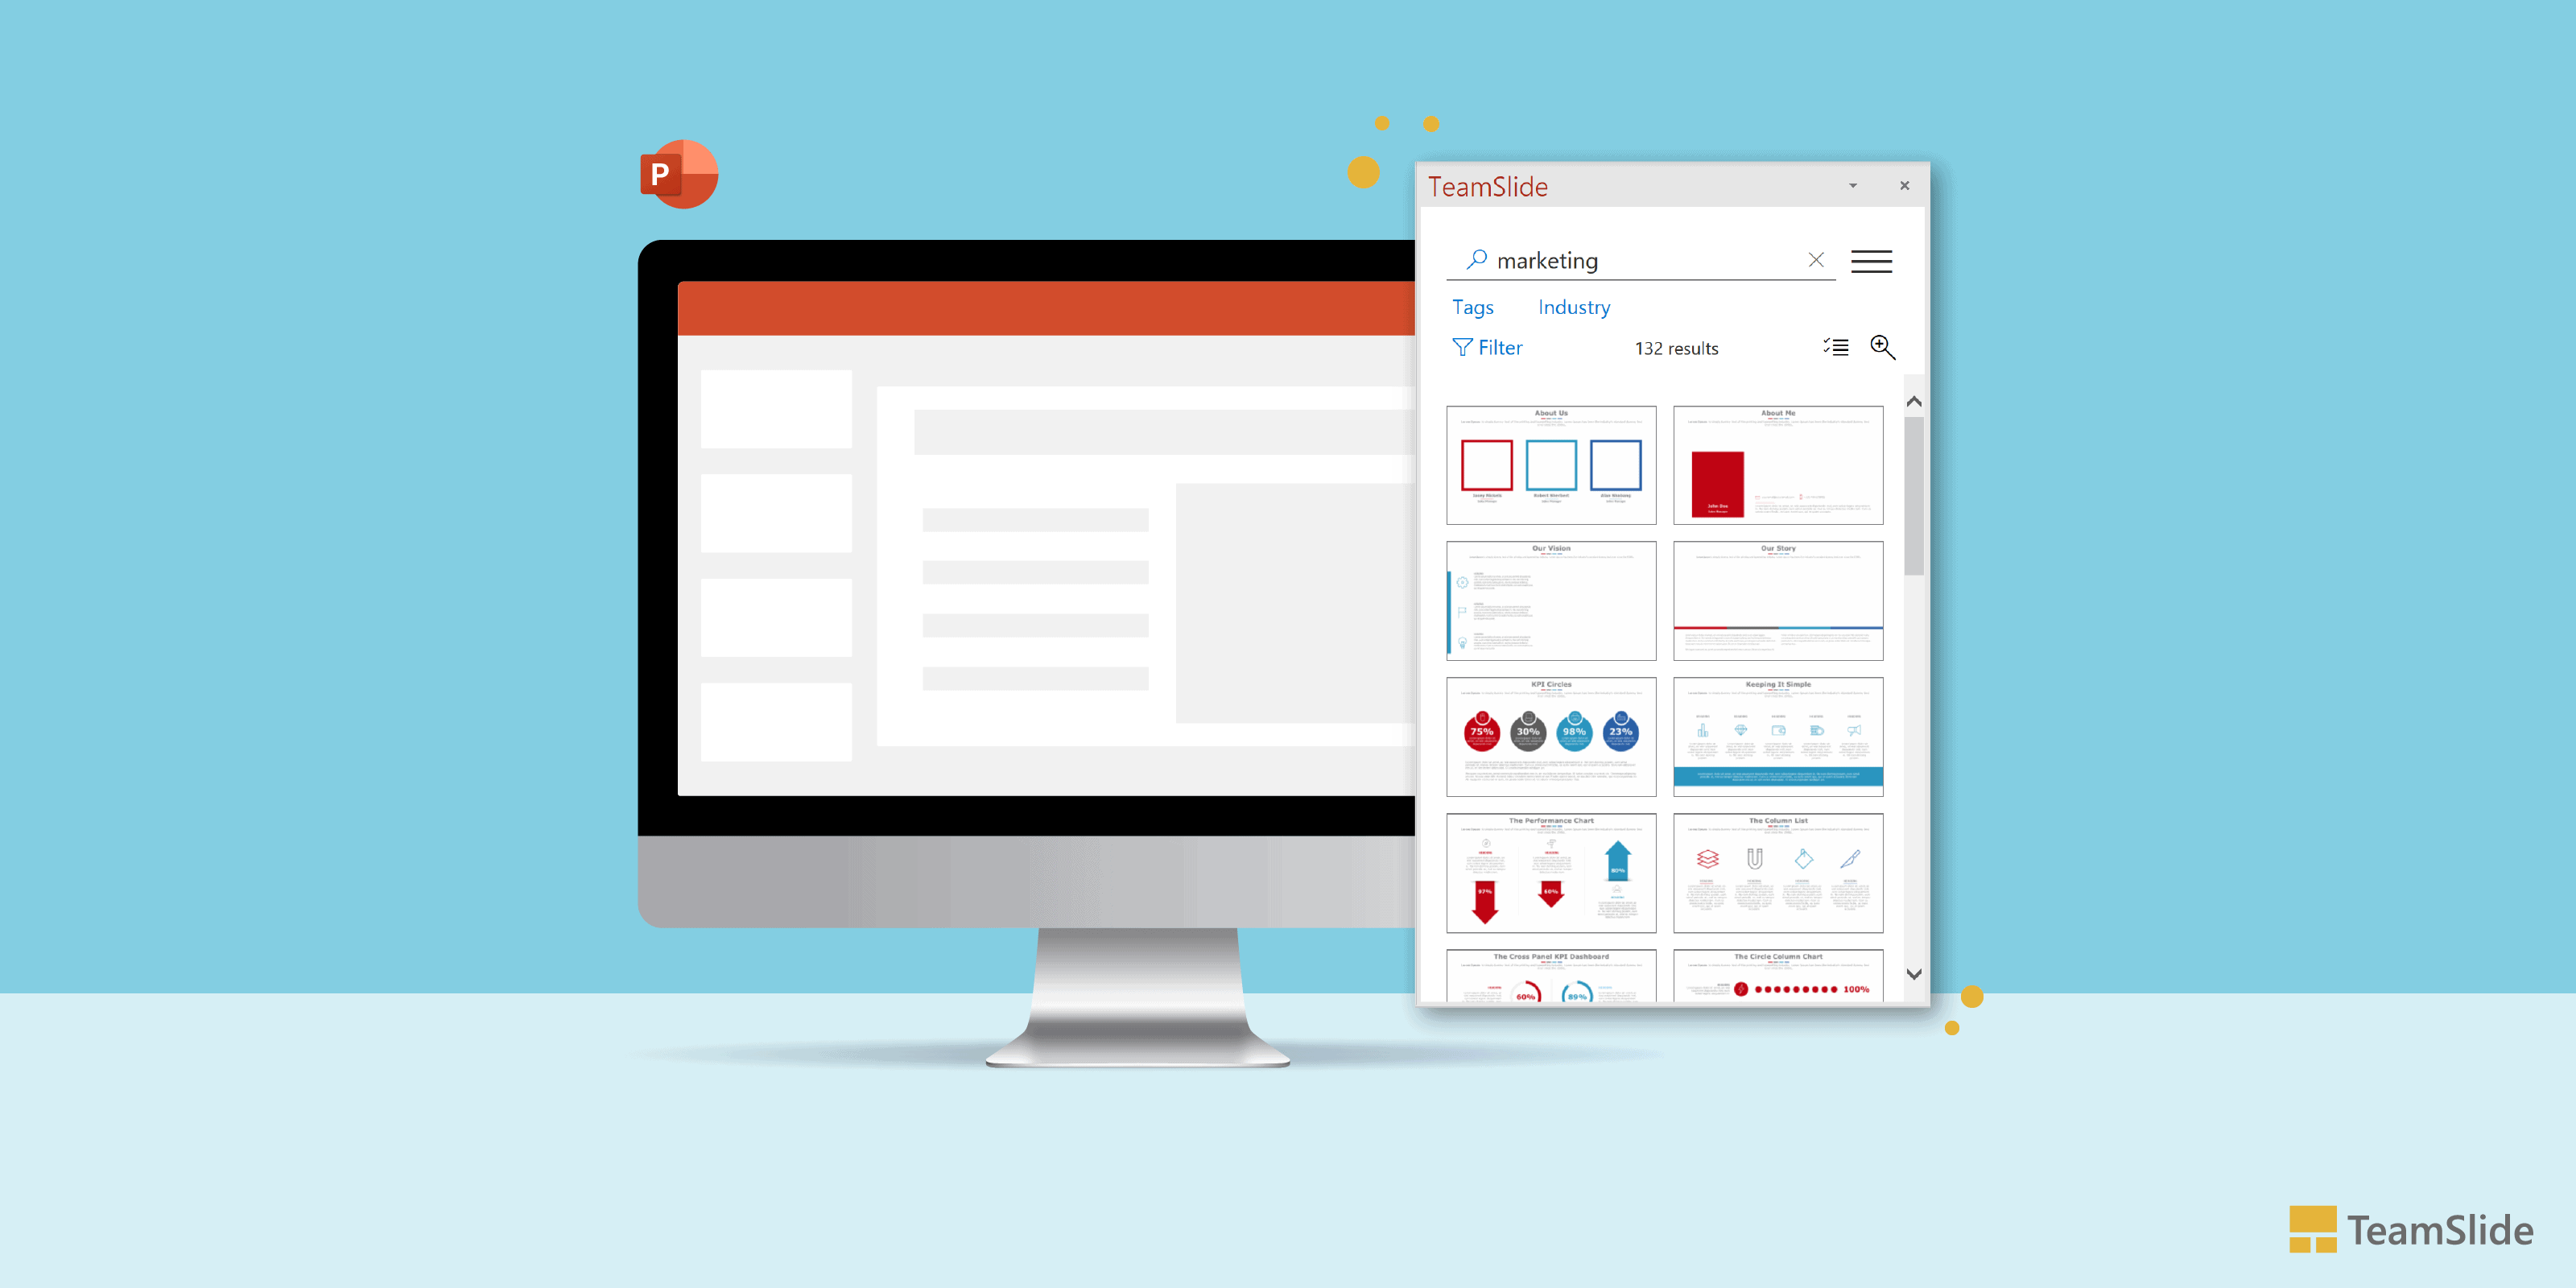 TeamSlide introduces new UI